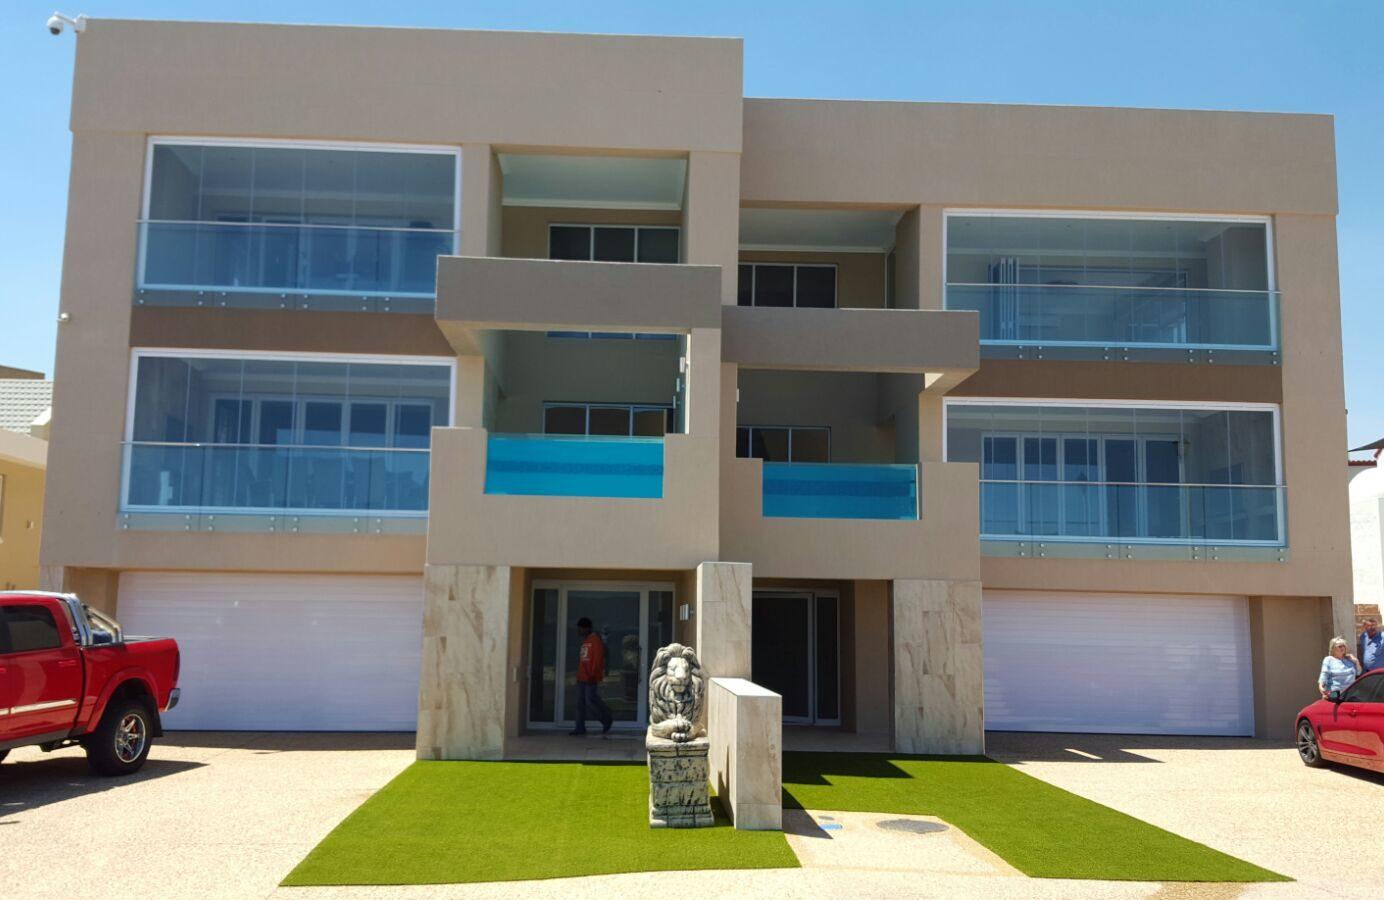 House Beets, Blouberg, Kwali Mark Construction